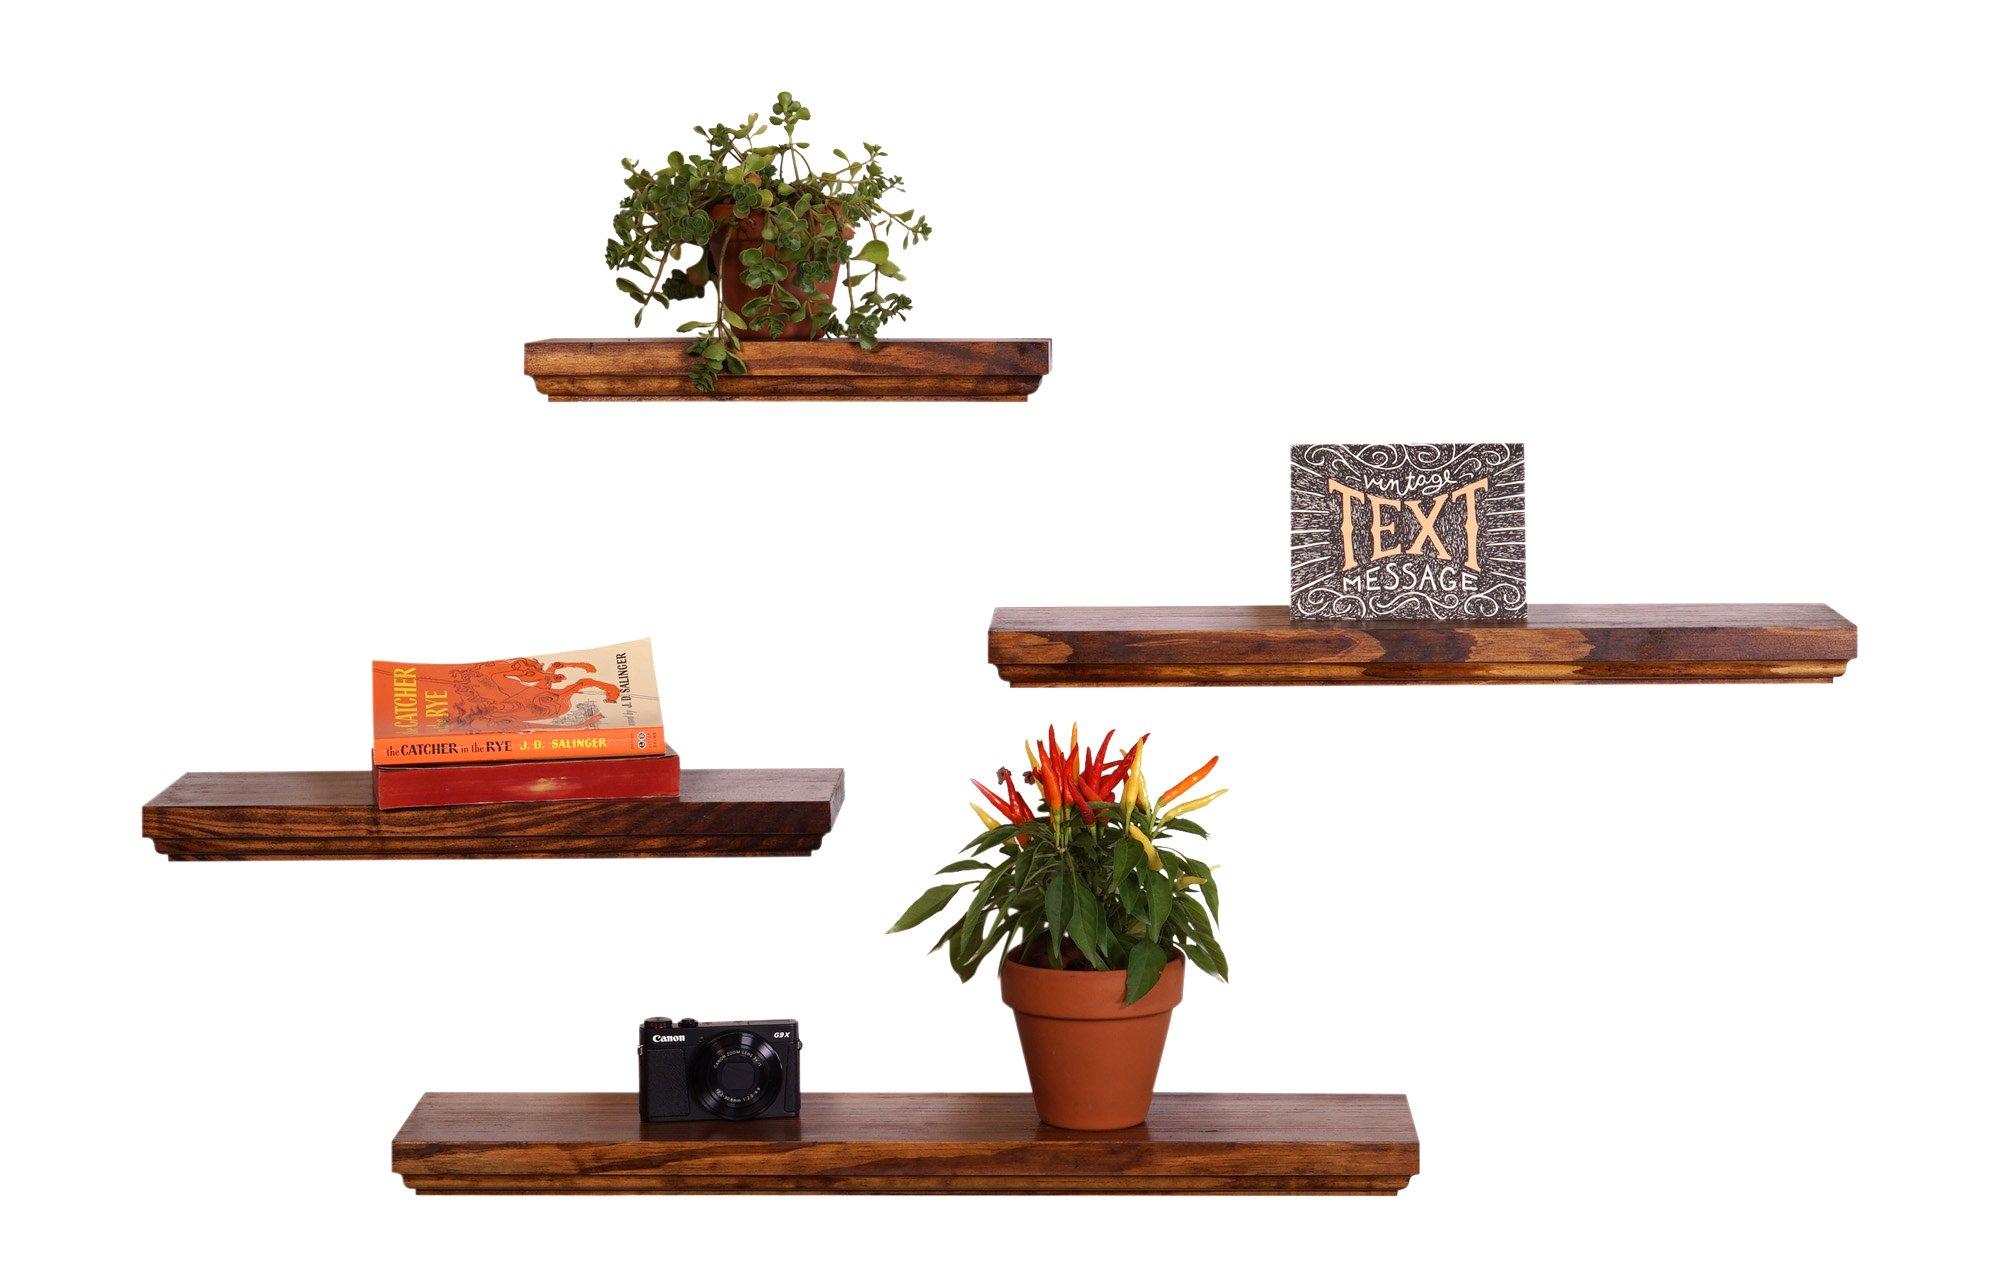 DAKODA LOVE Routed Edge Floating Shelves, USA Handmade, Clear Coat Finish, 100% Countersunk Hidden Floating Shelf Brackets, Beautiful Grain Pine Wood Wall Decor (Set of 4) (Bourbon) by DAKODA LOVE (Image #1)